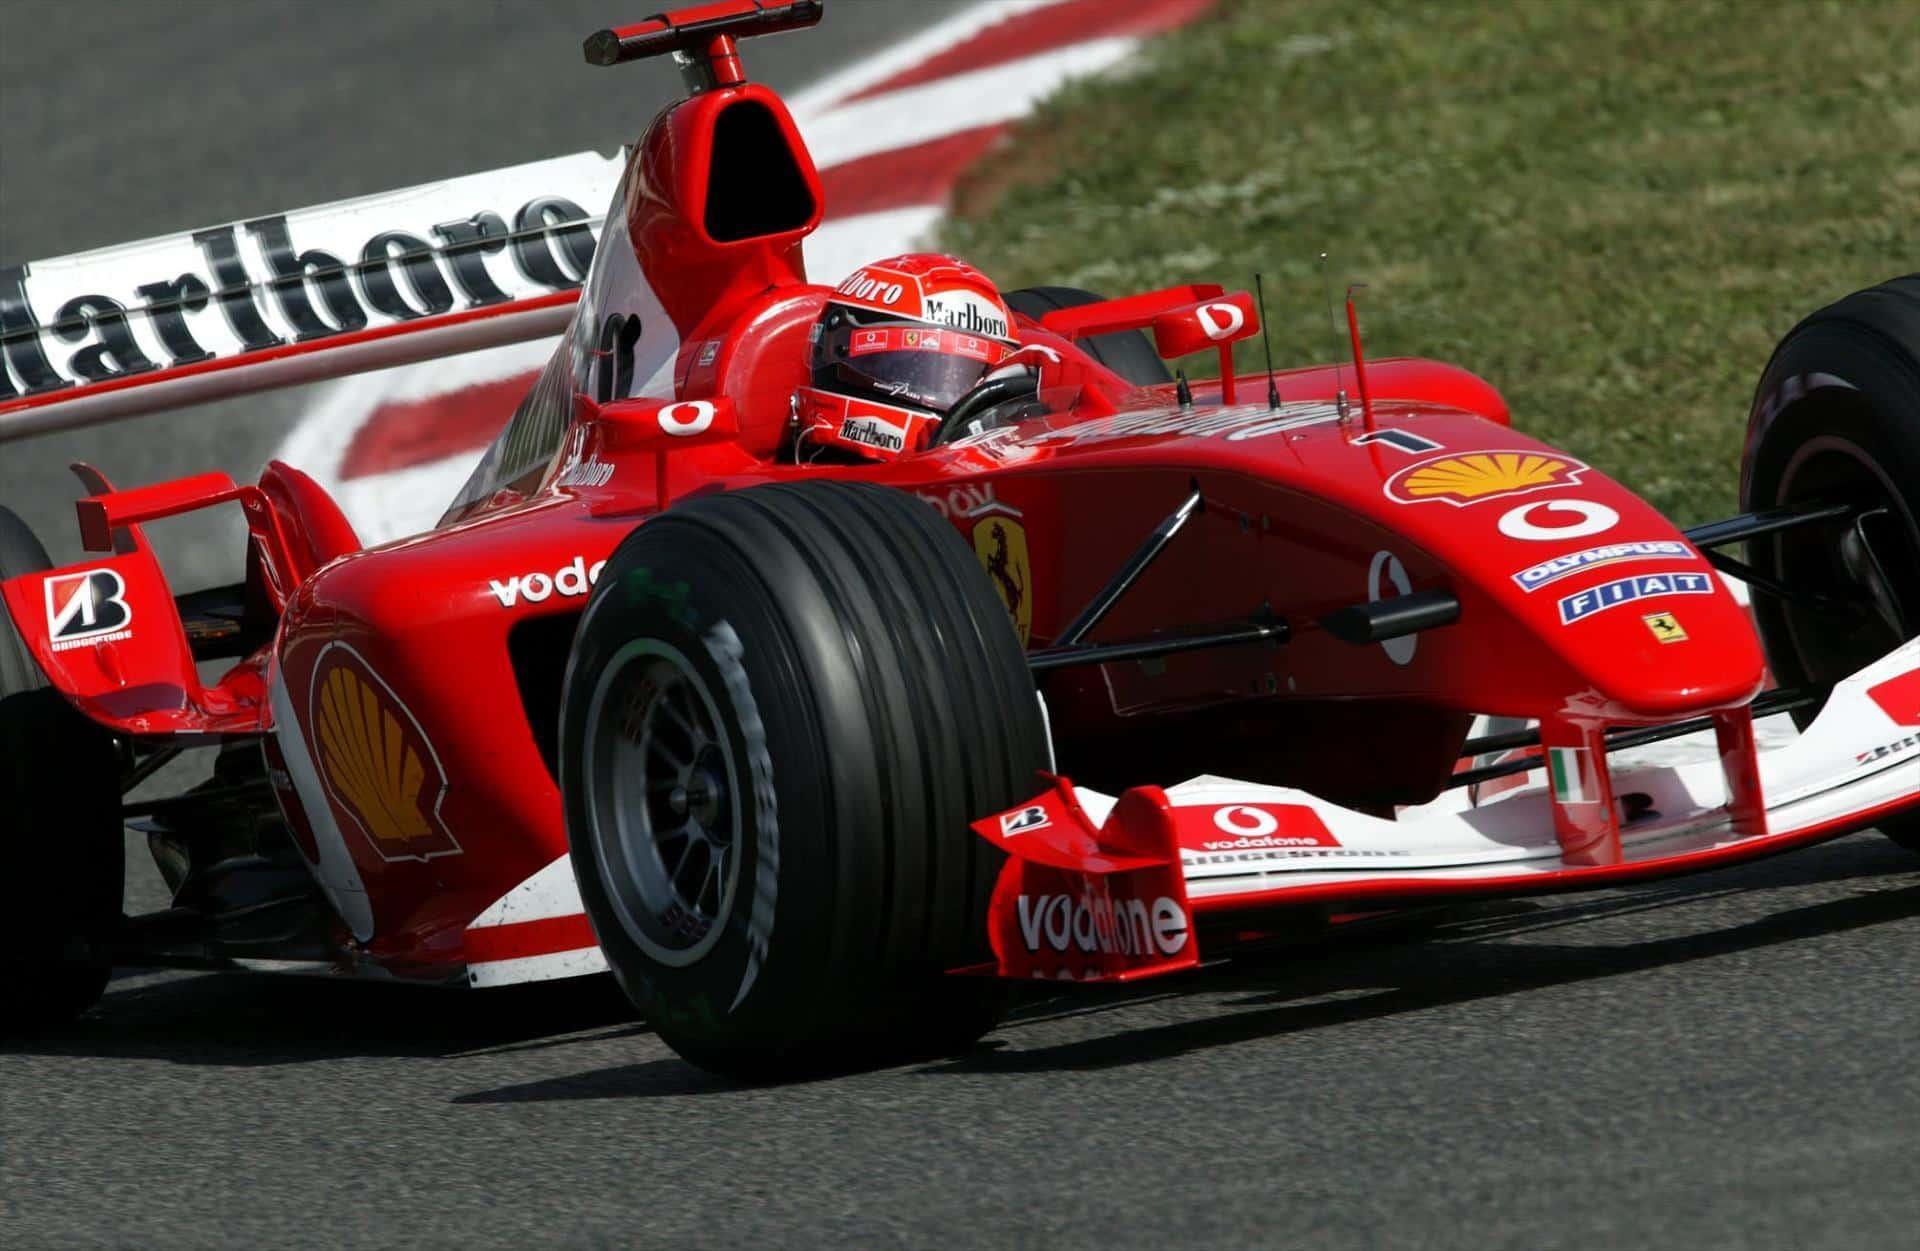 2003 Spanish GP – Schumacher wins in new F2003-GA, Alonso splits the Ferraris